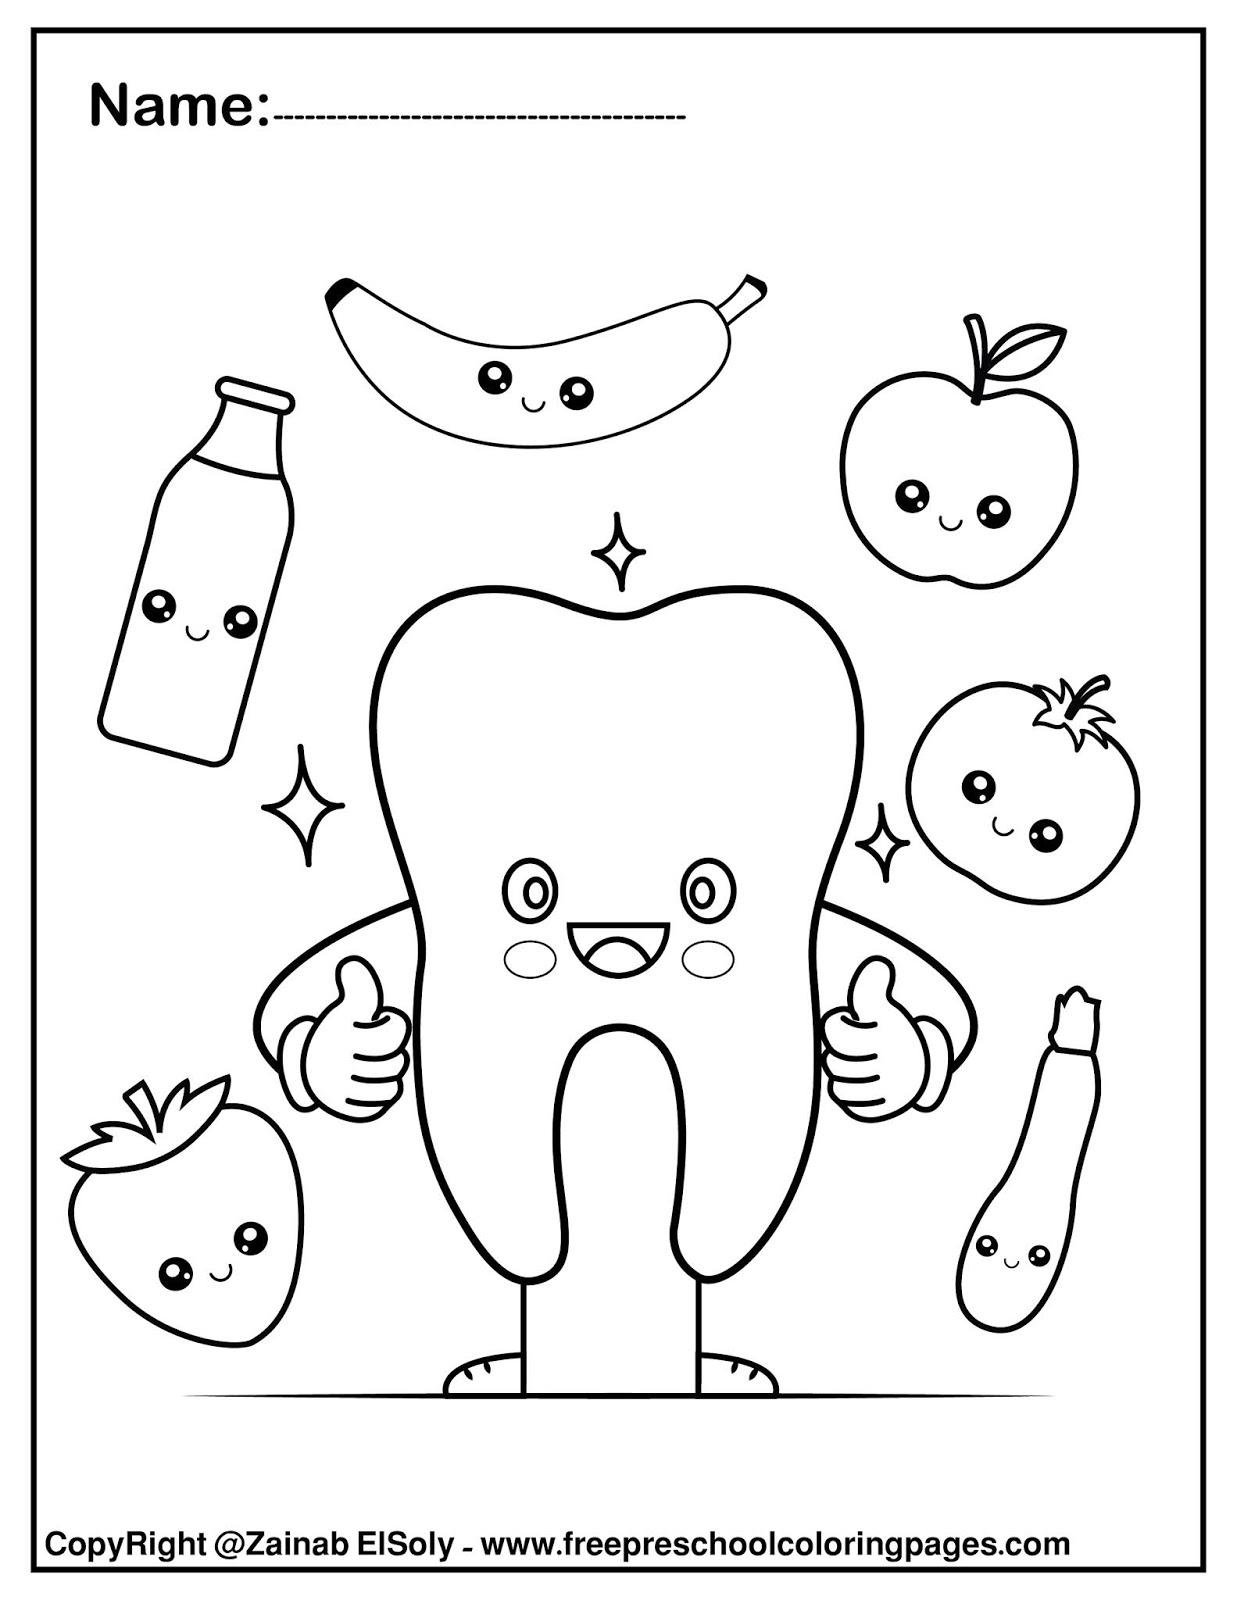 Free Kid's Dental Coloring Sheets, Activities and Charts ... | 1600x1237